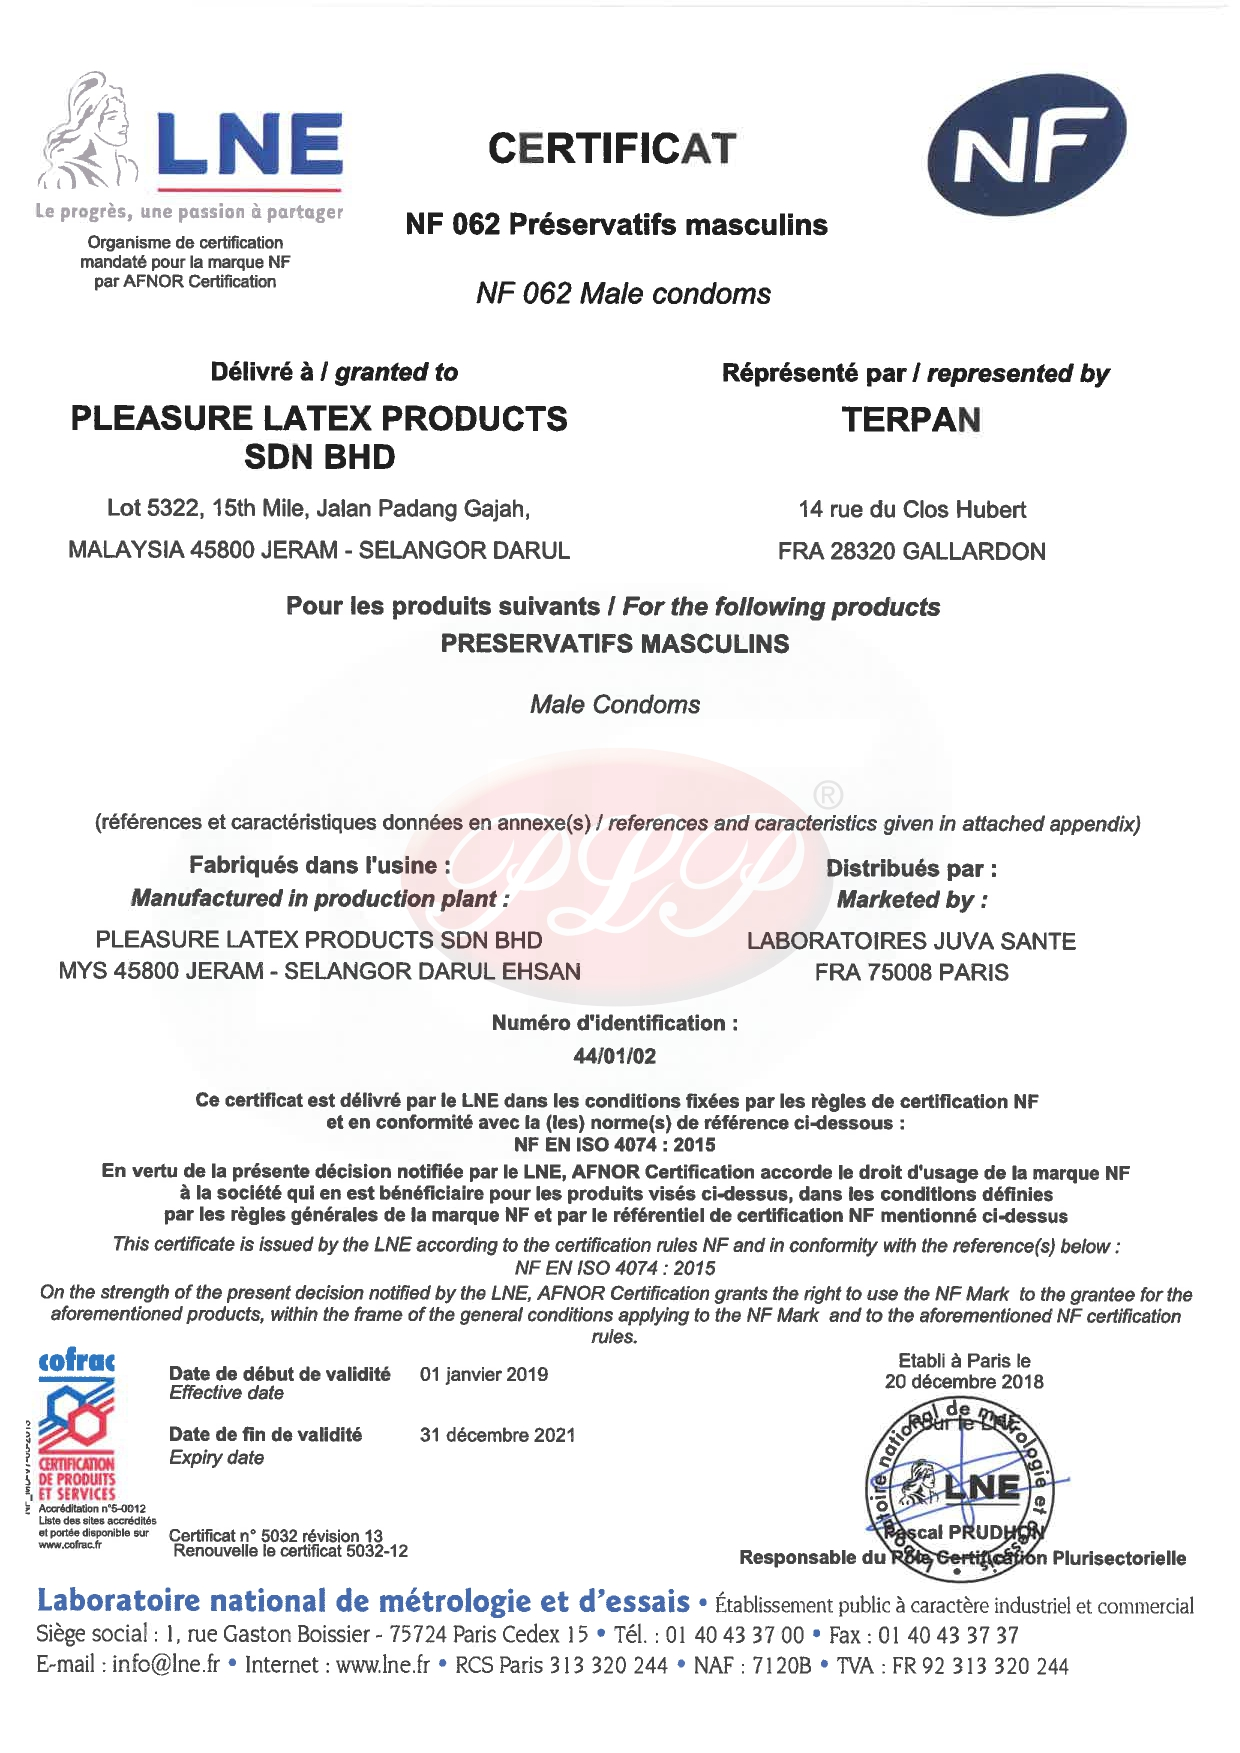 NF Mark Certificate